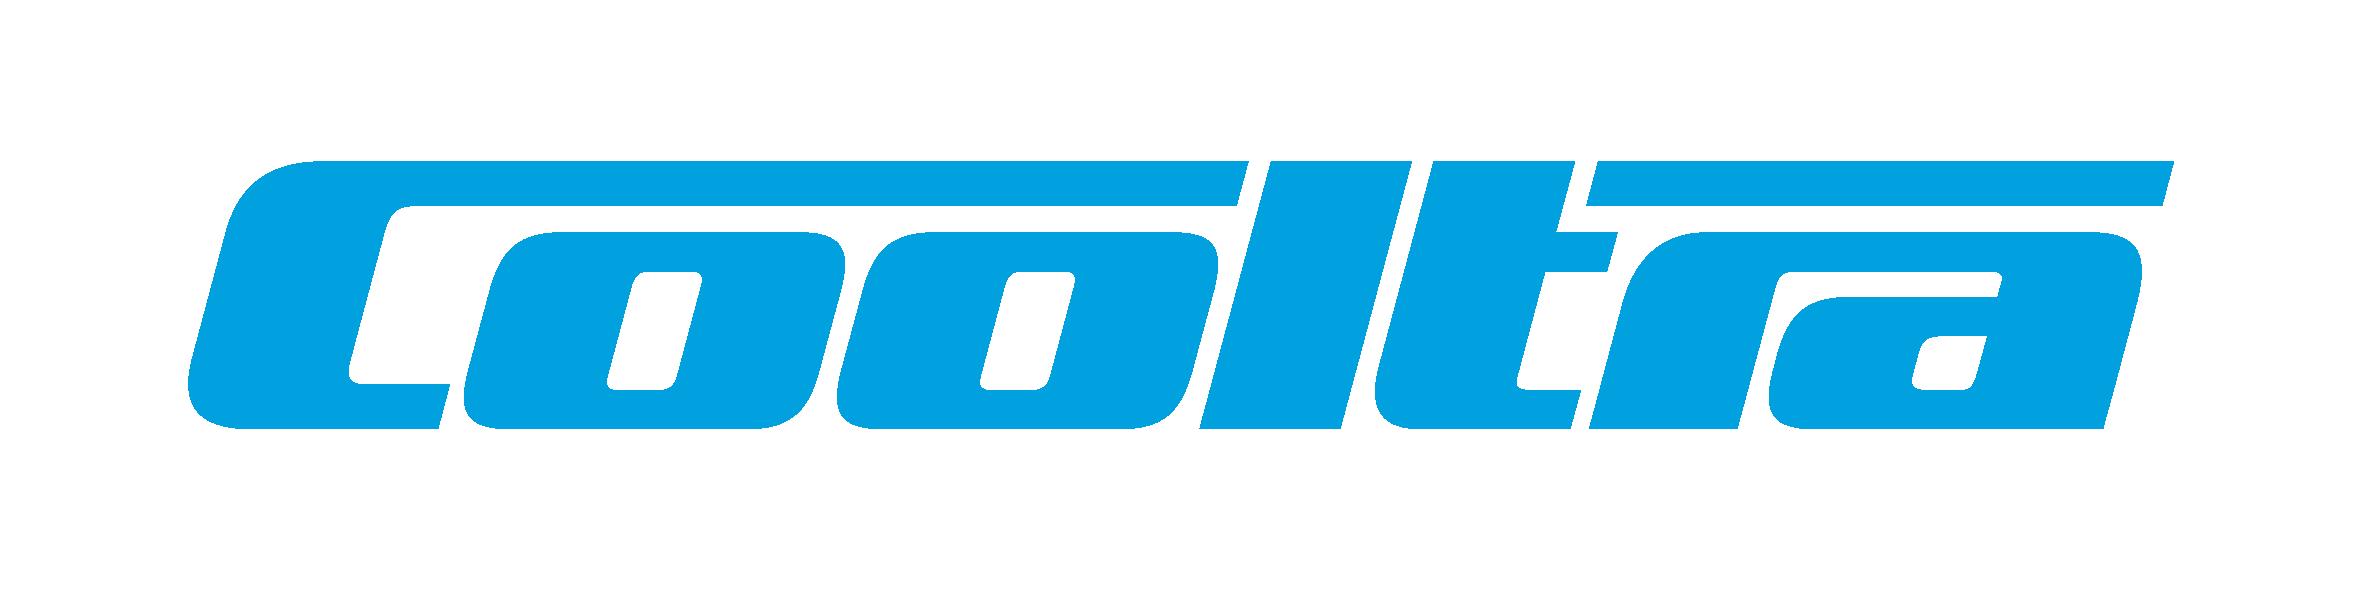 Cooltra_logo